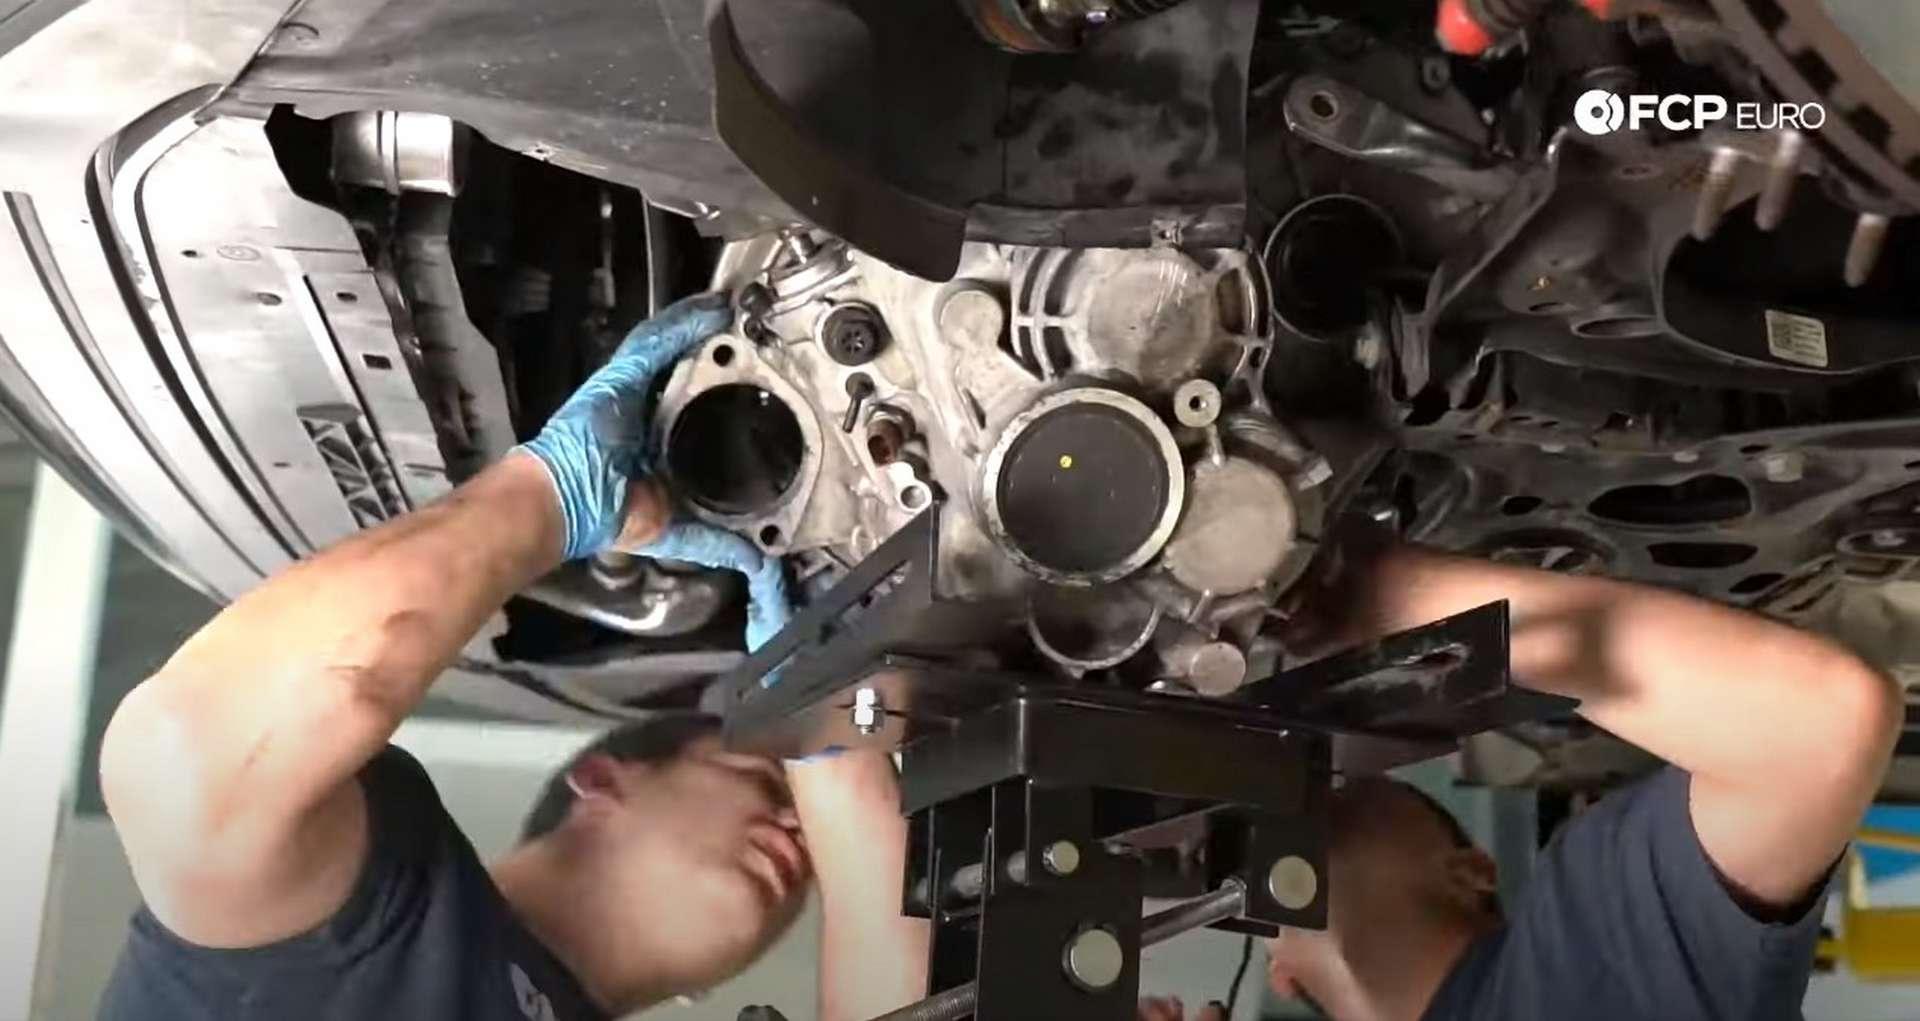 43-DIY_VW_GTI_Clutch-Job-Removing-Transmission